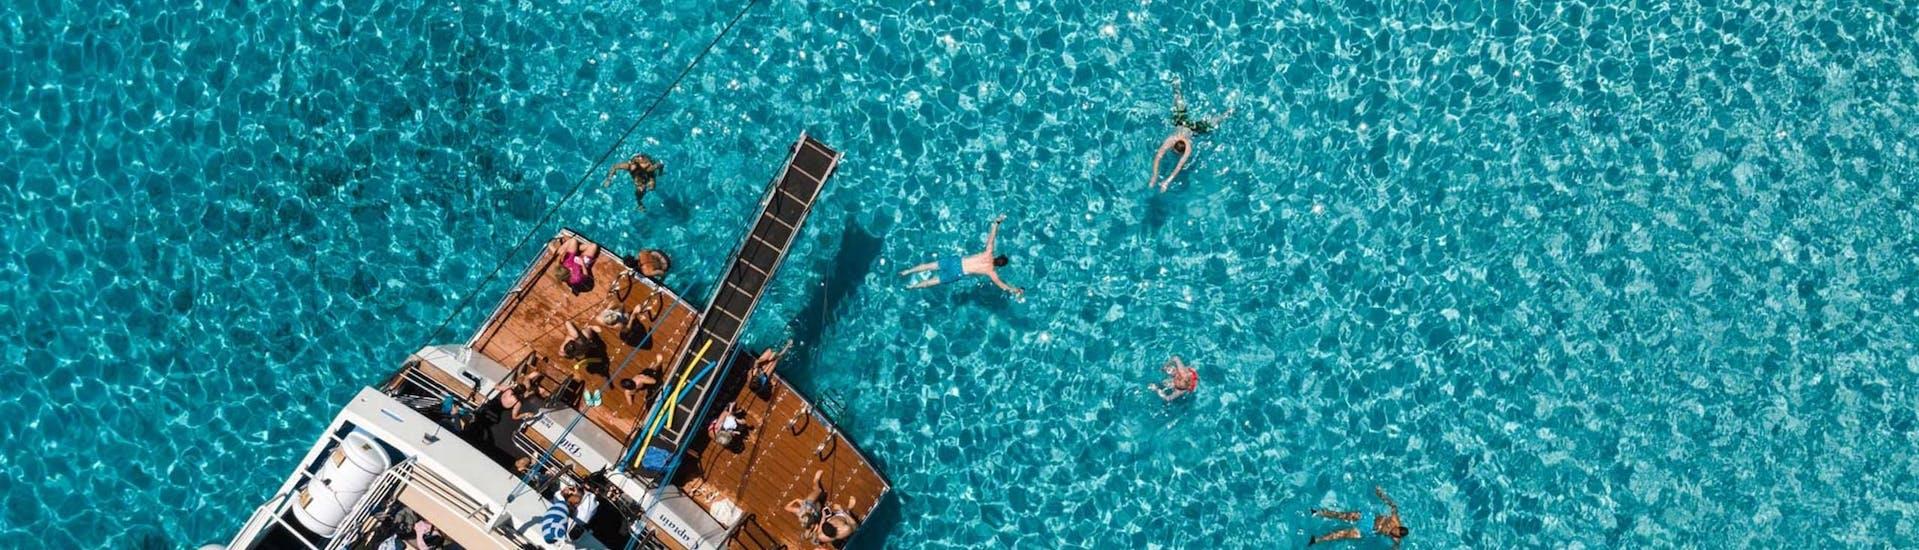 boat-tour-from-corfu-to-blue-lagoon-corfu-cruises-hero